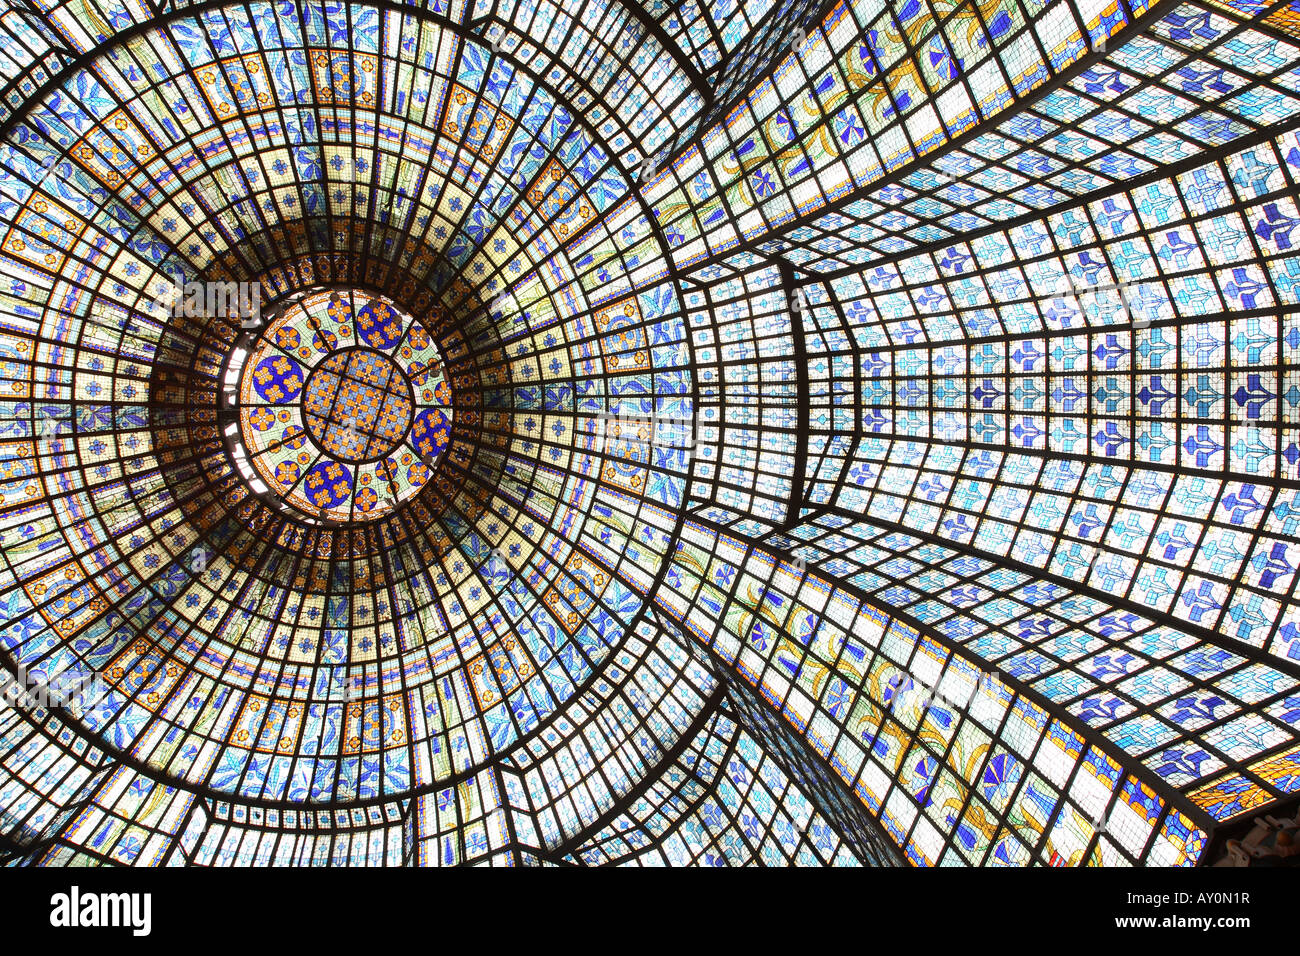 The Dome at Printemps Department Store Restaurant, Paris, France - Stock Image